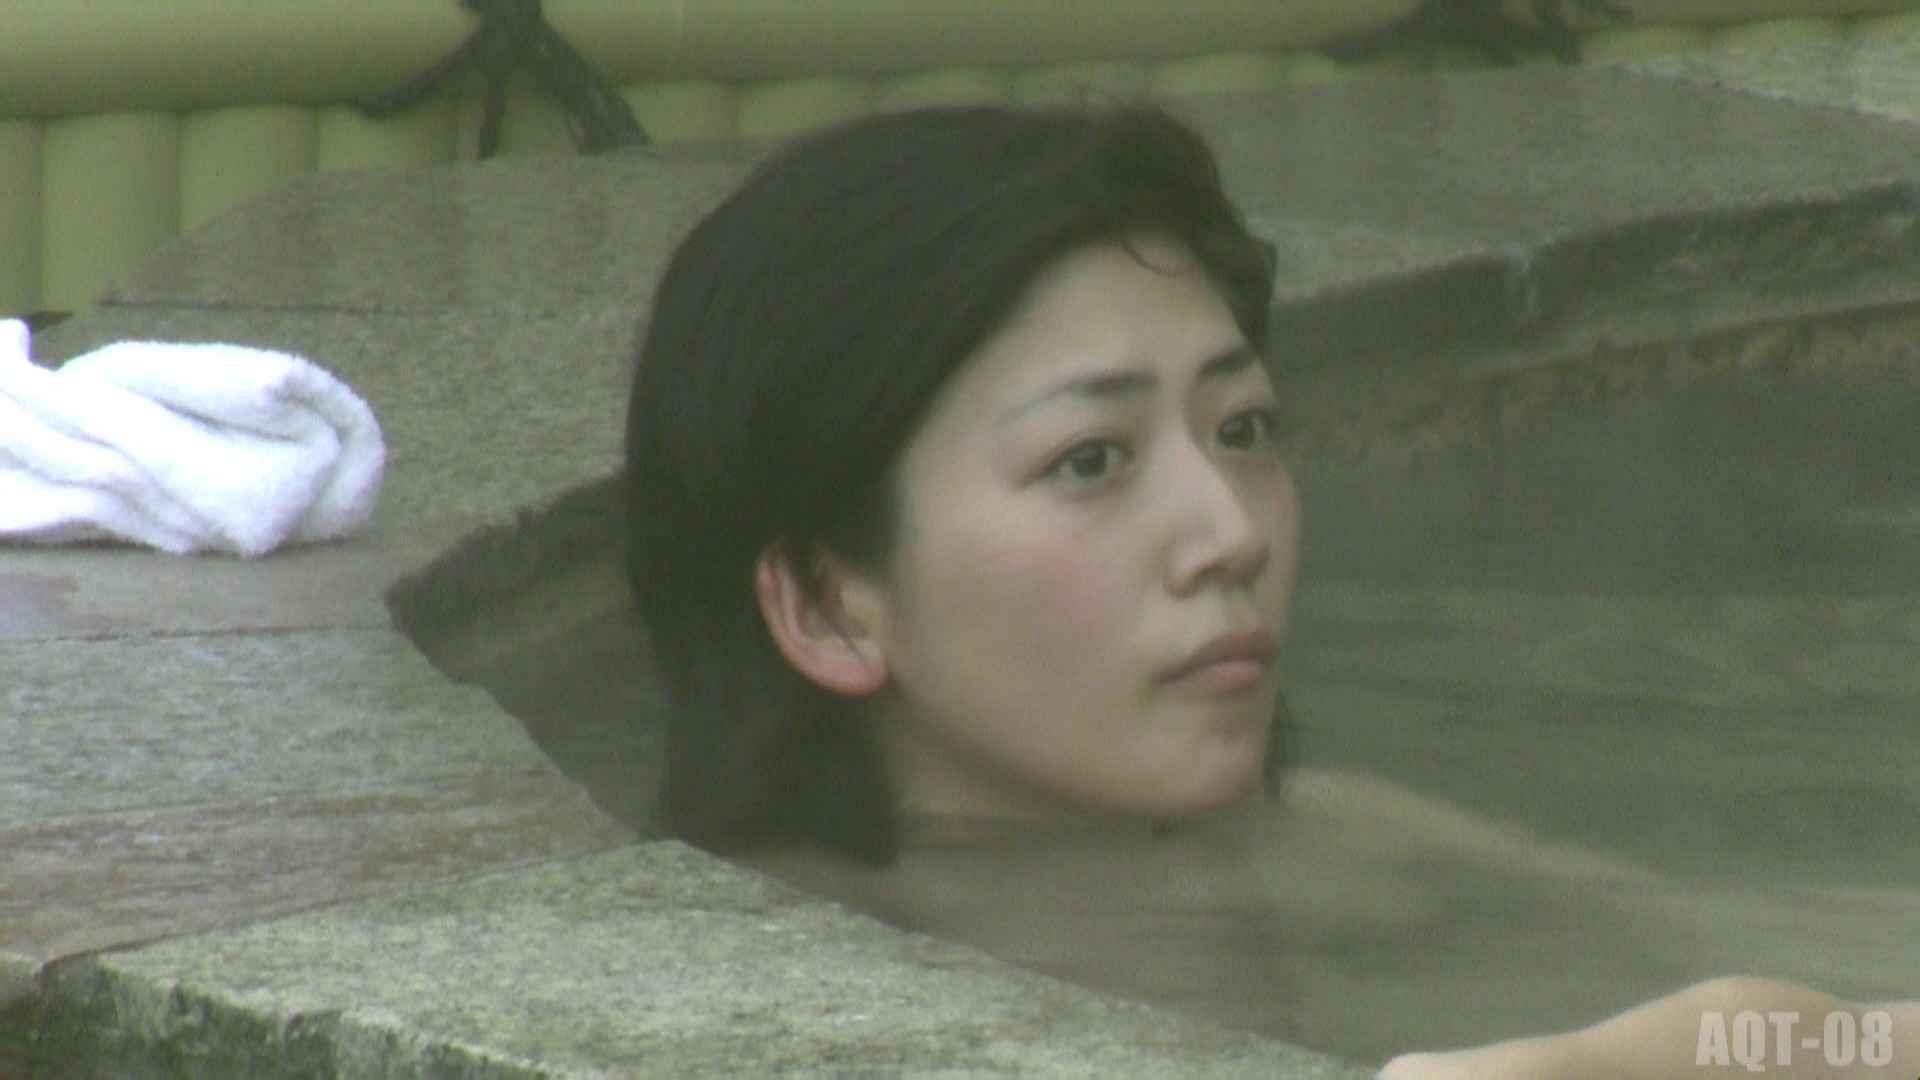 Aquaな露天風呂Vol.776 盗撮 エロ無料画像 108画像 32